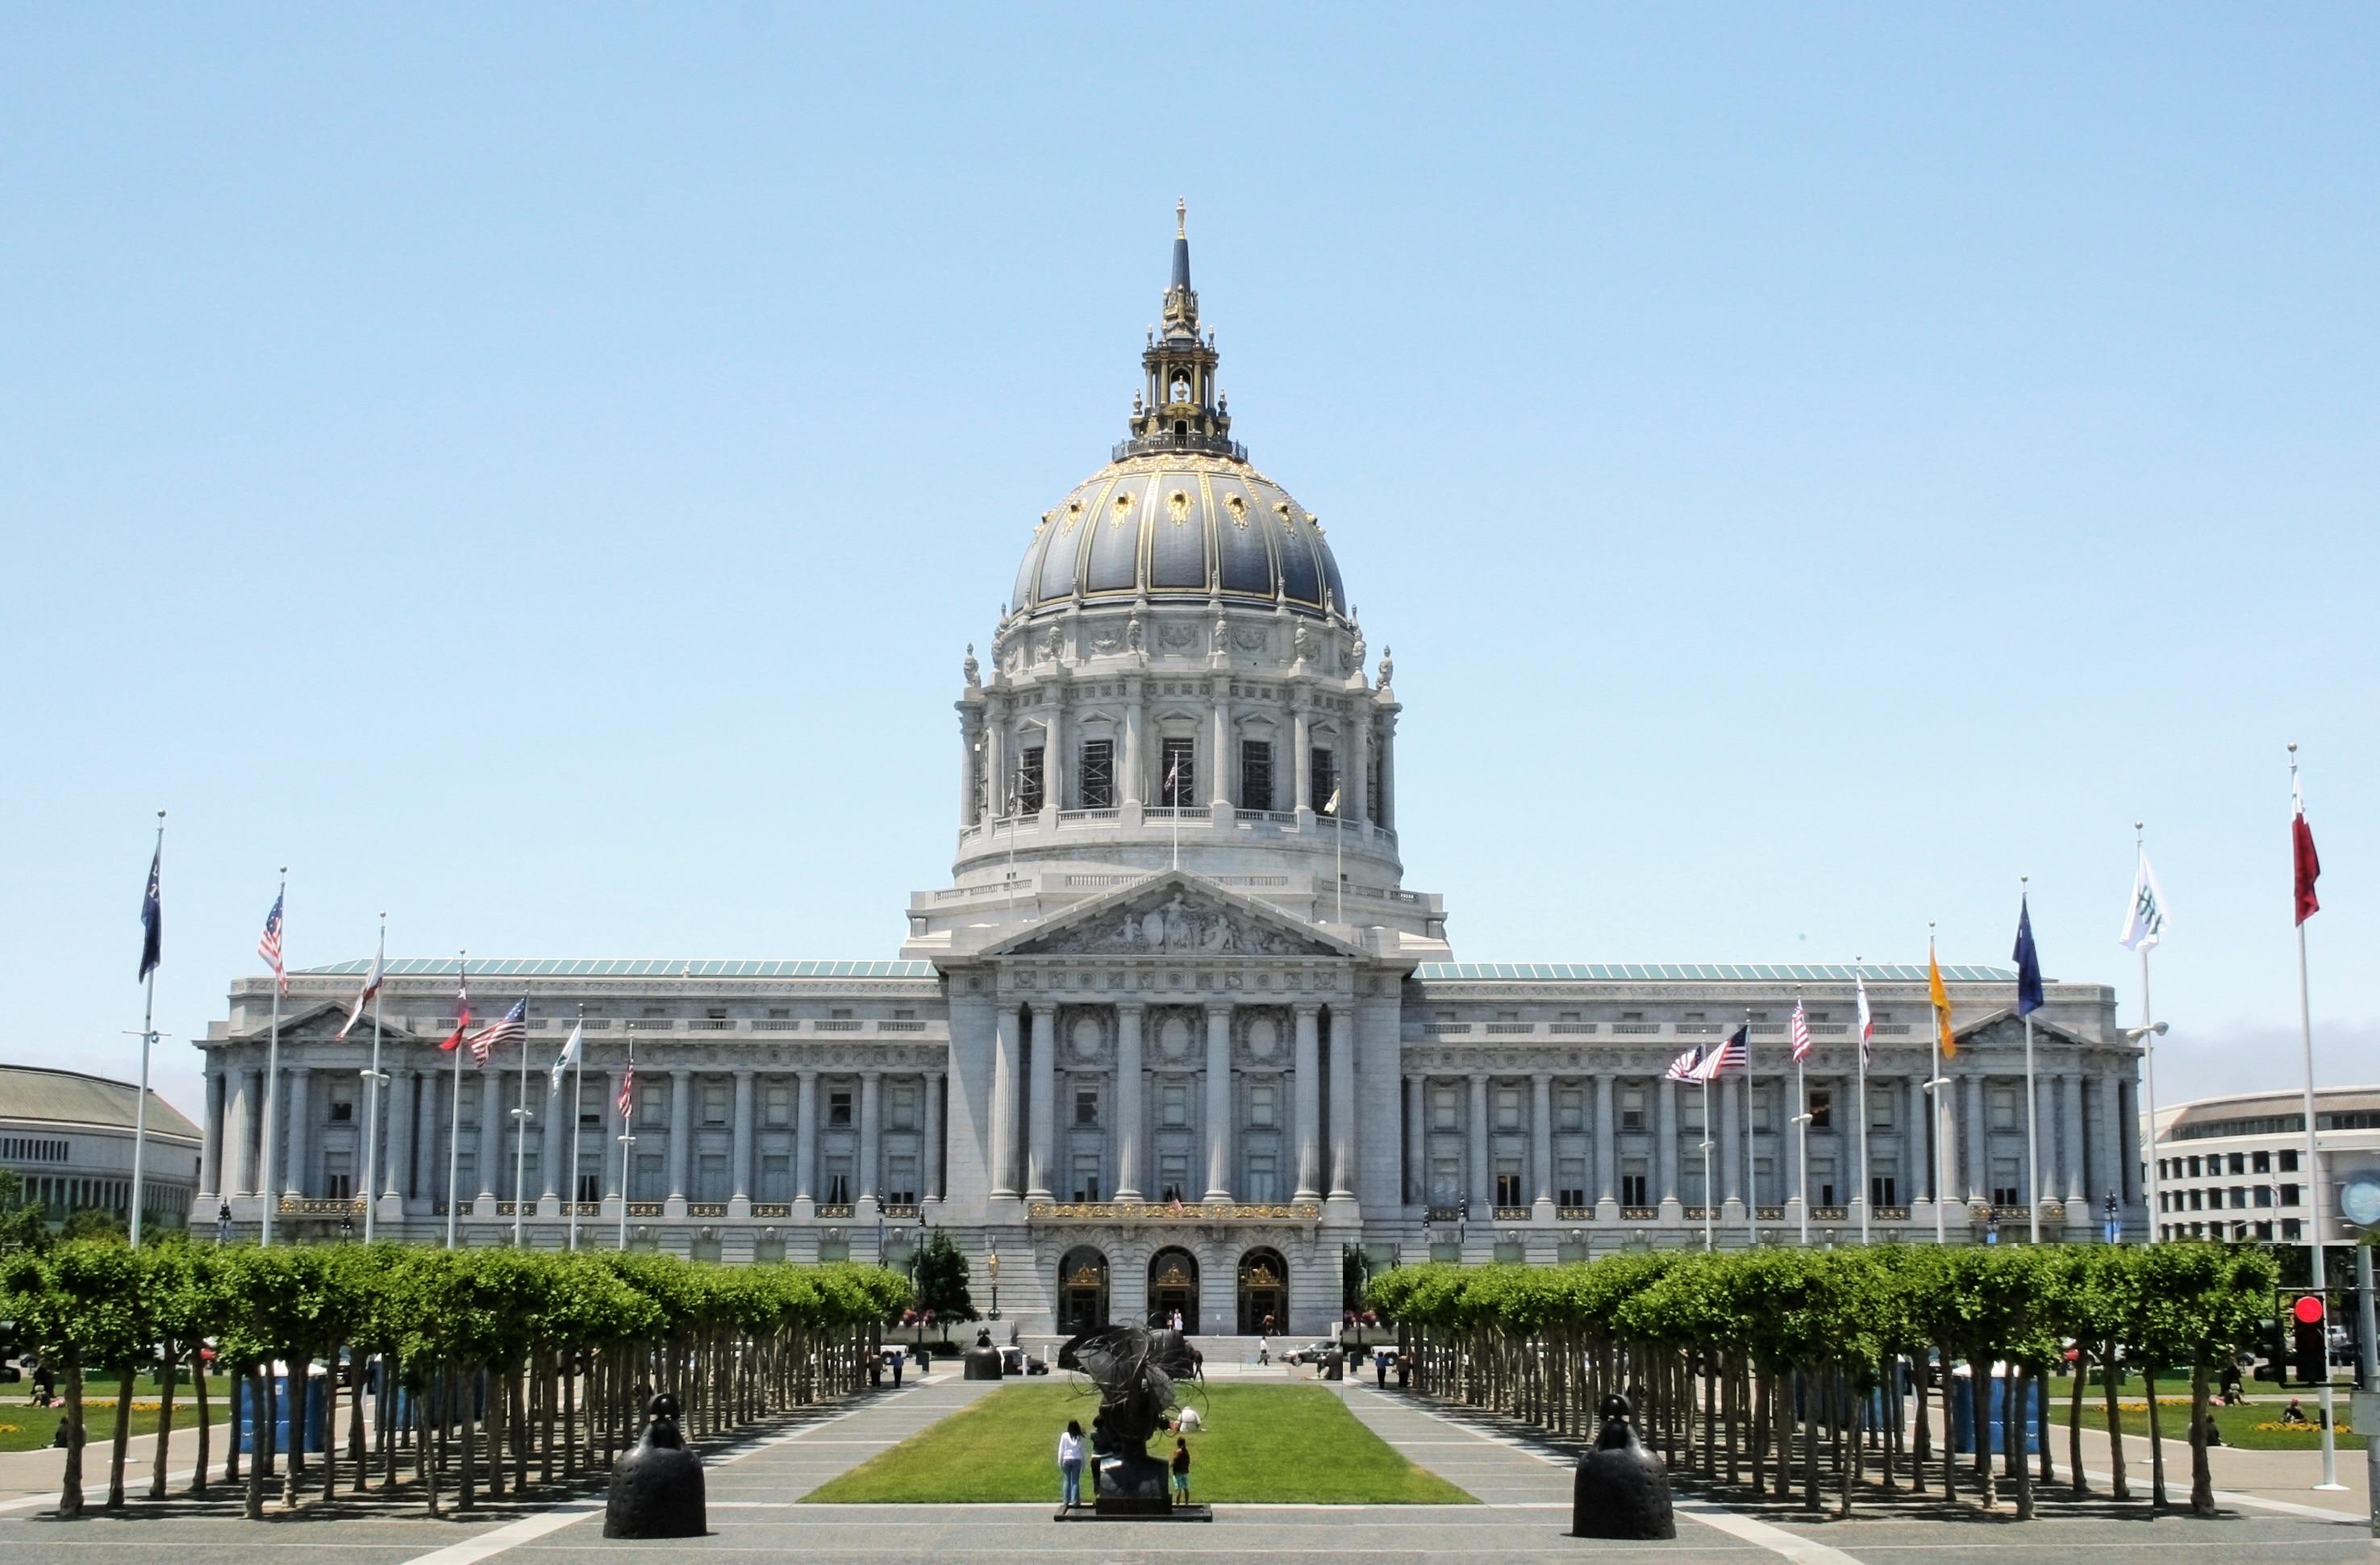 Van Ness Avenue, San Francisco, California, United States of America